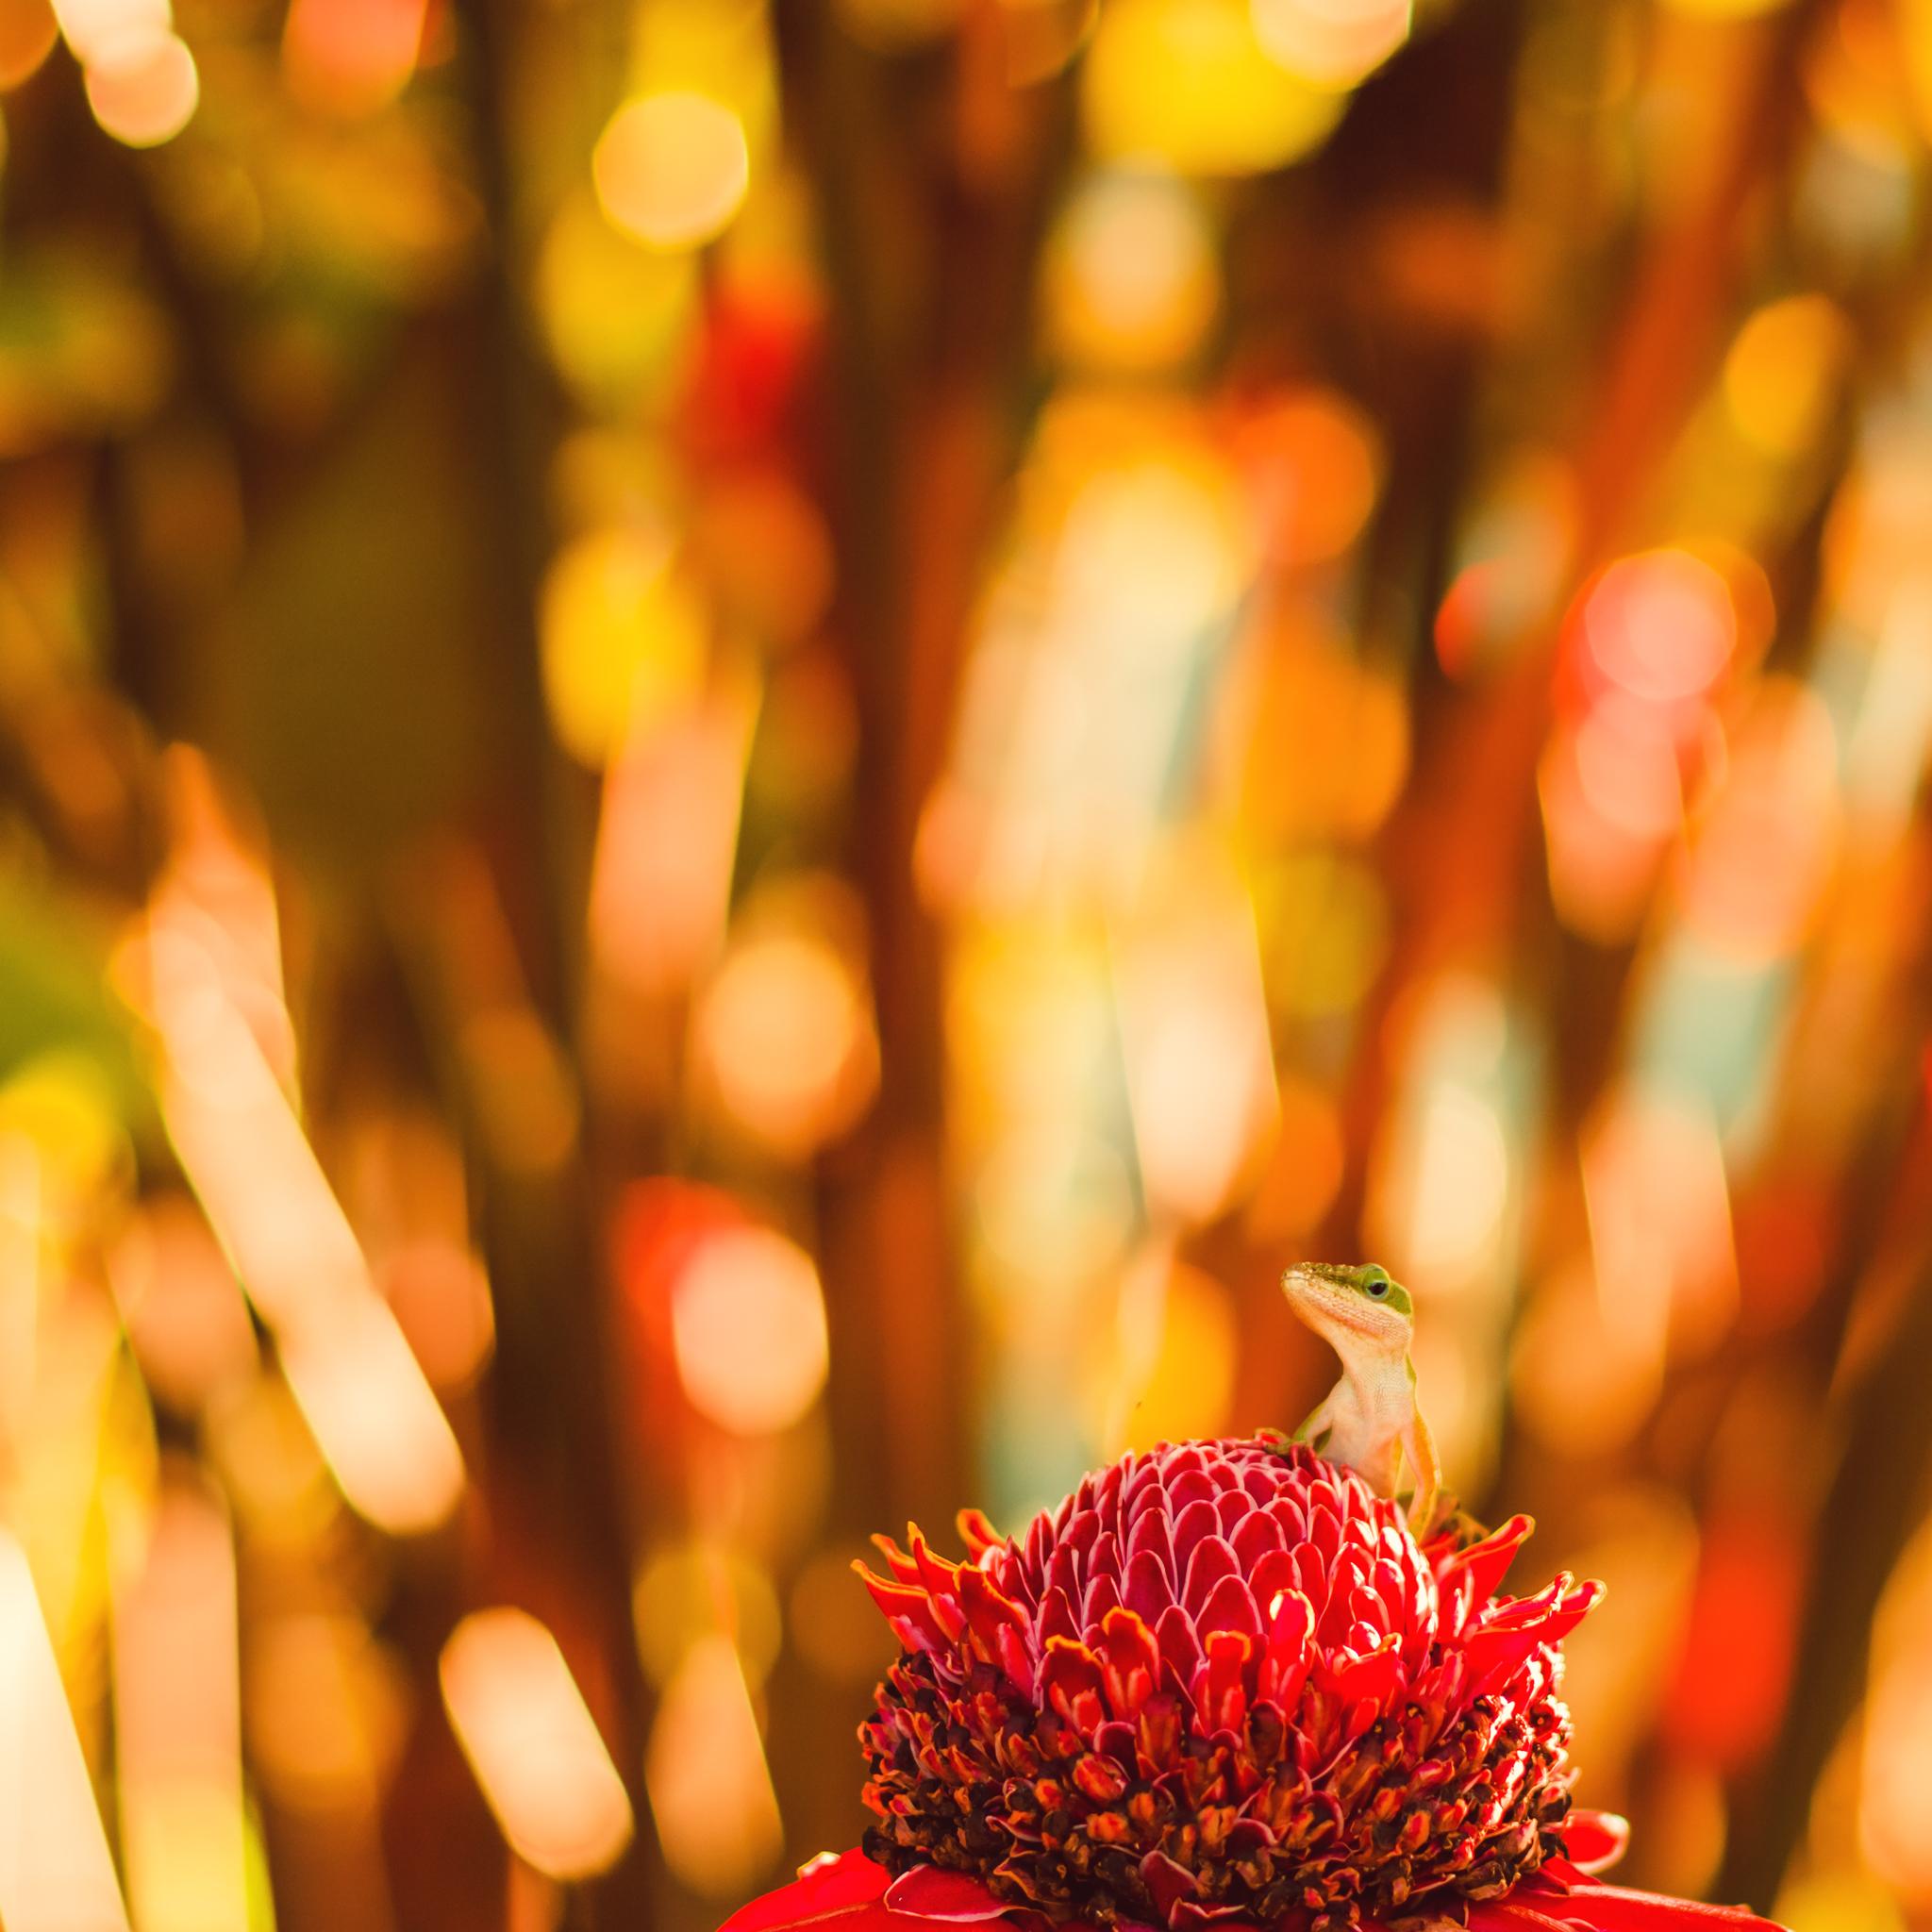 IMG_0206-WEB-KAUAI-HAWAII-JENNIFER-PICARD-PHOTOGRAPHY.jpg